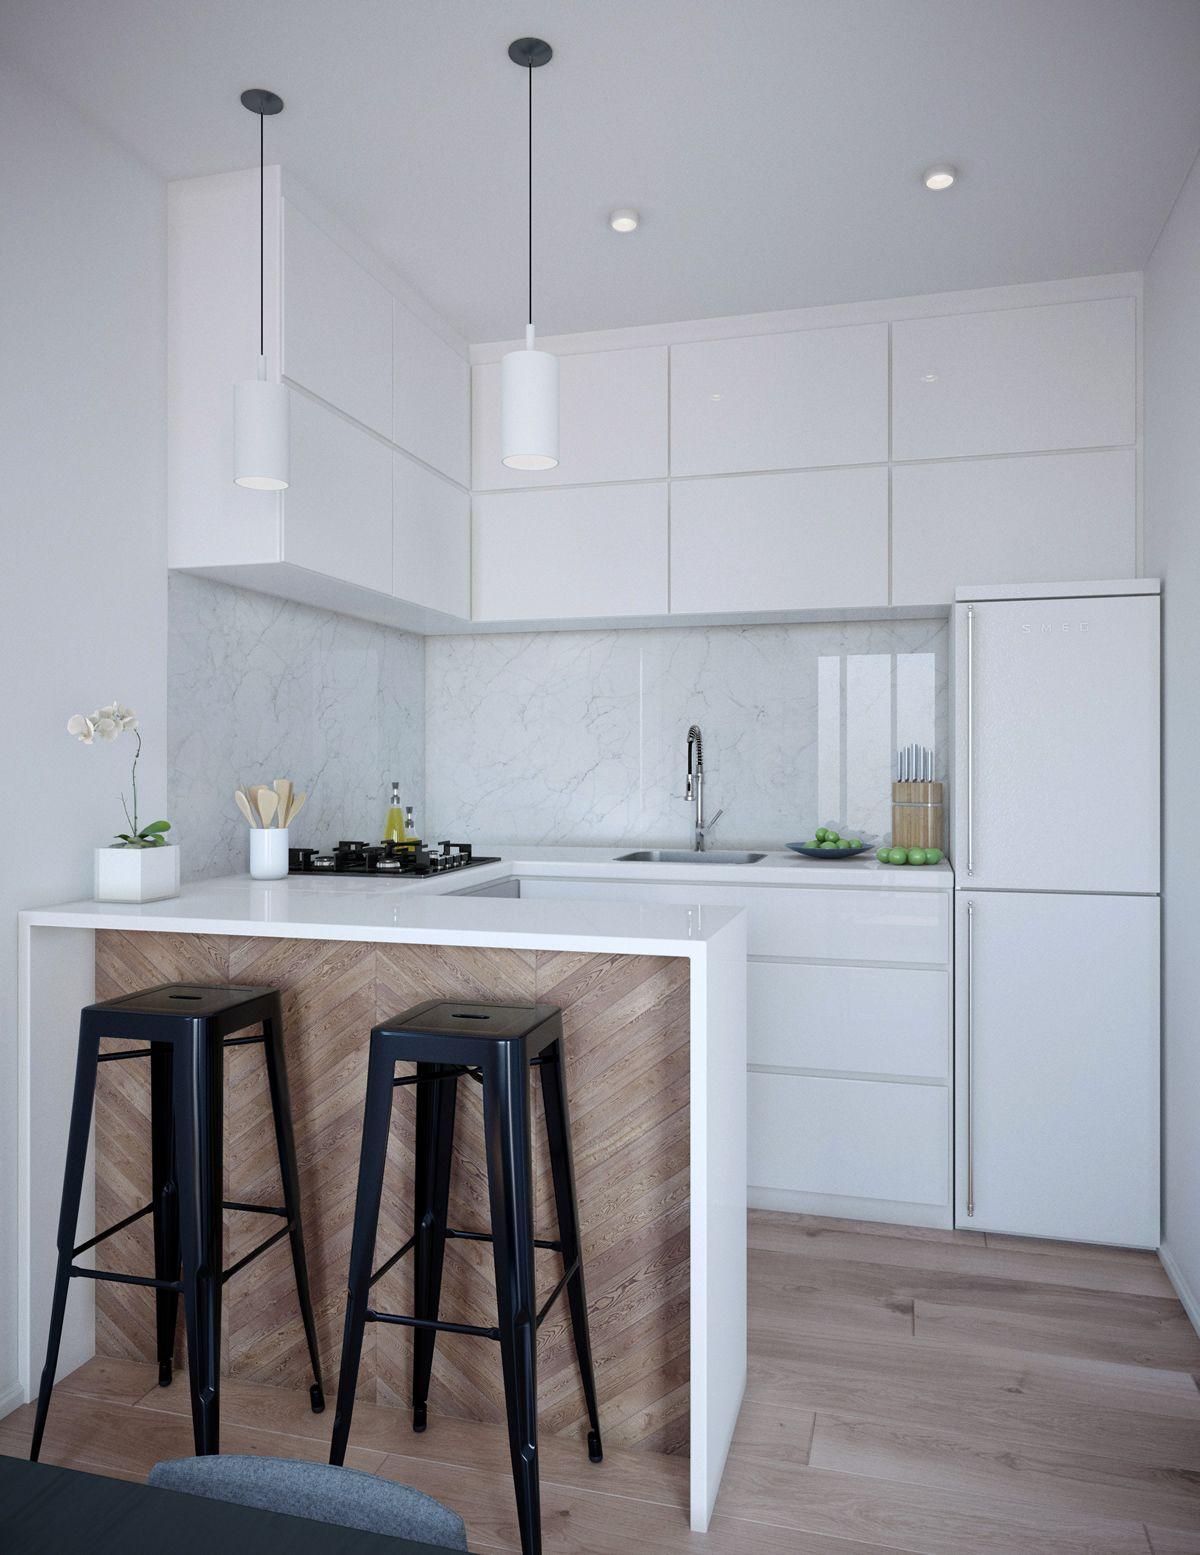 Flat Kitchen Designs: Pin By Eszter Boros On Kitchen